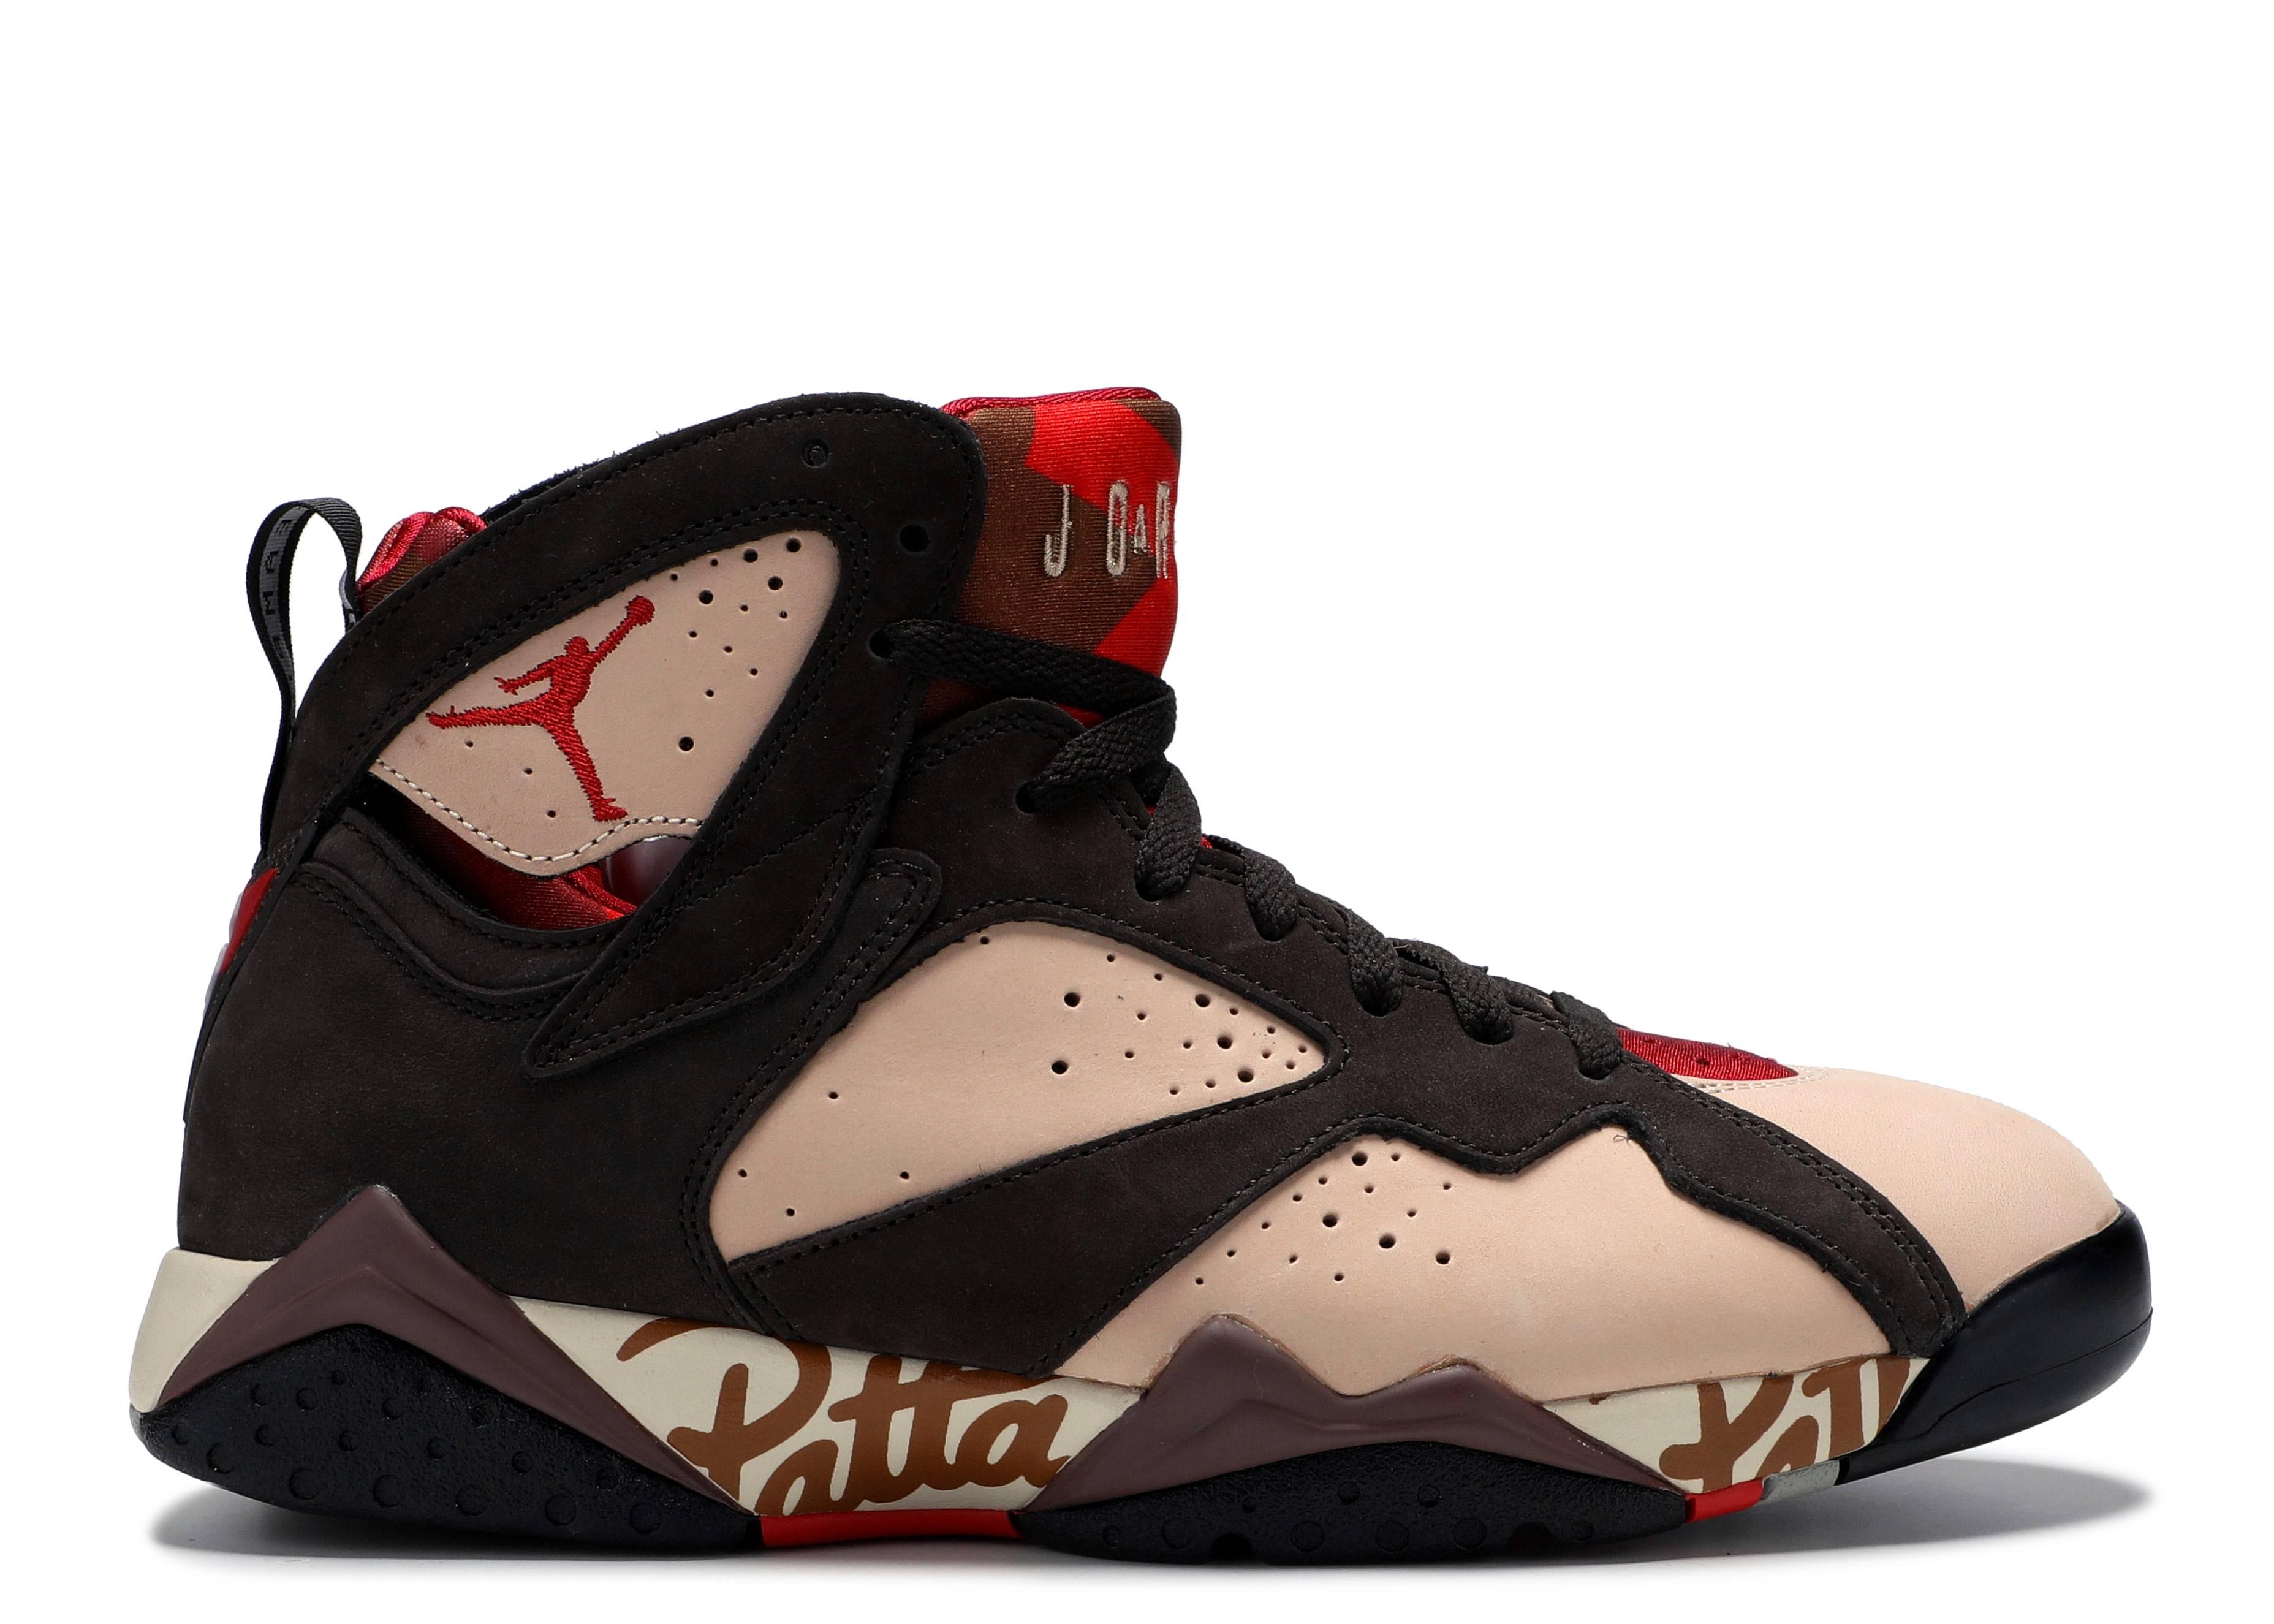 special for shoe info for low priced Air Jordan 7 Retro Patta